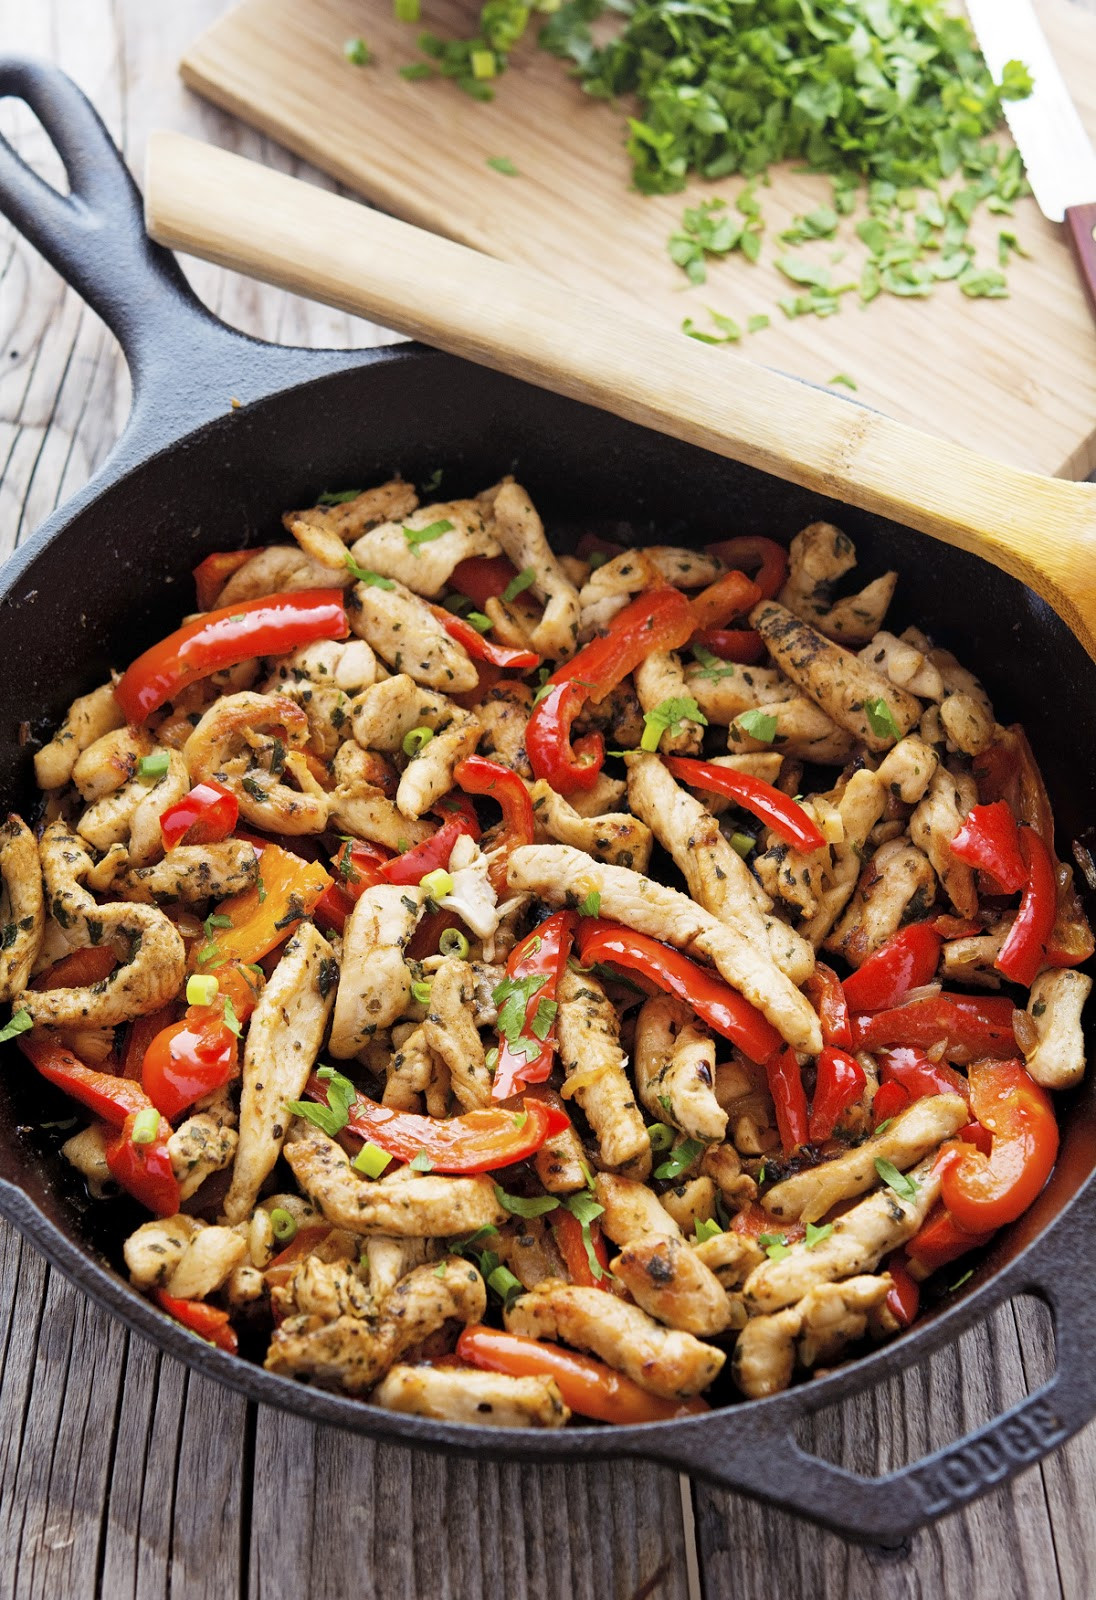 Low Fat Chicken Fajitas  The Iron You 20 Minute Skillet Chicken Fajitas